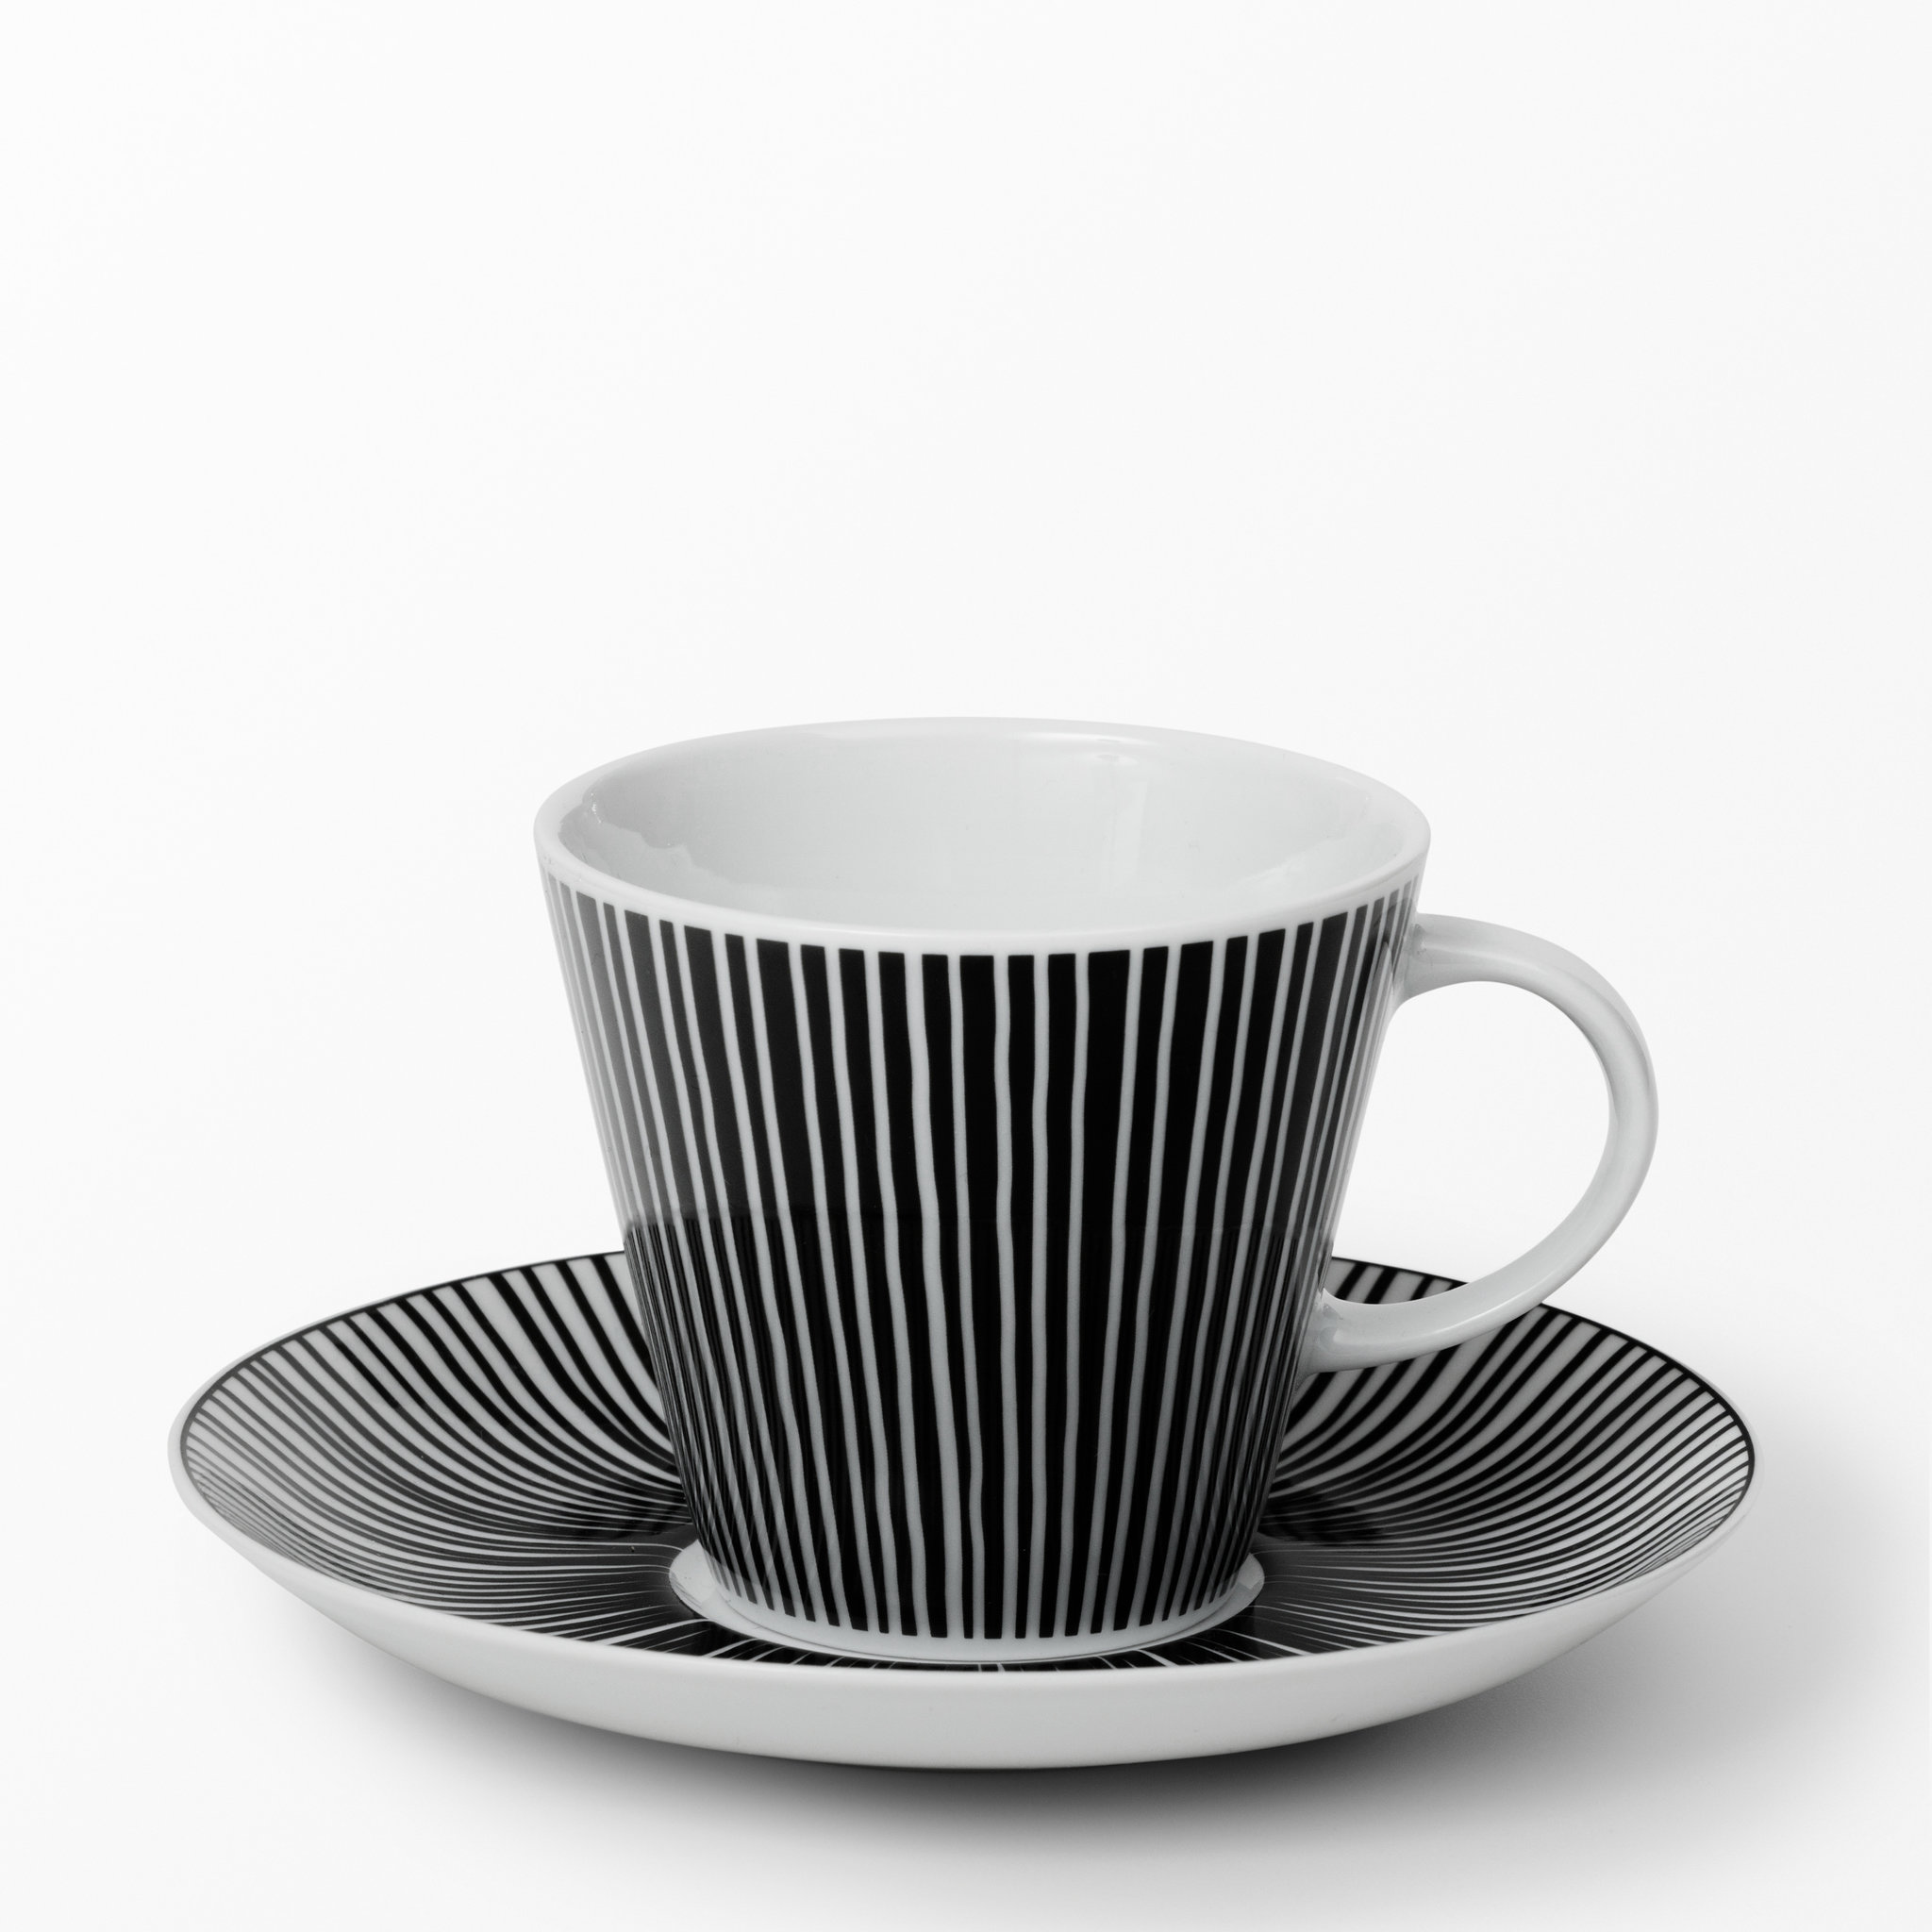 Muggar & koppar   kök   köp online på åhlens.se!